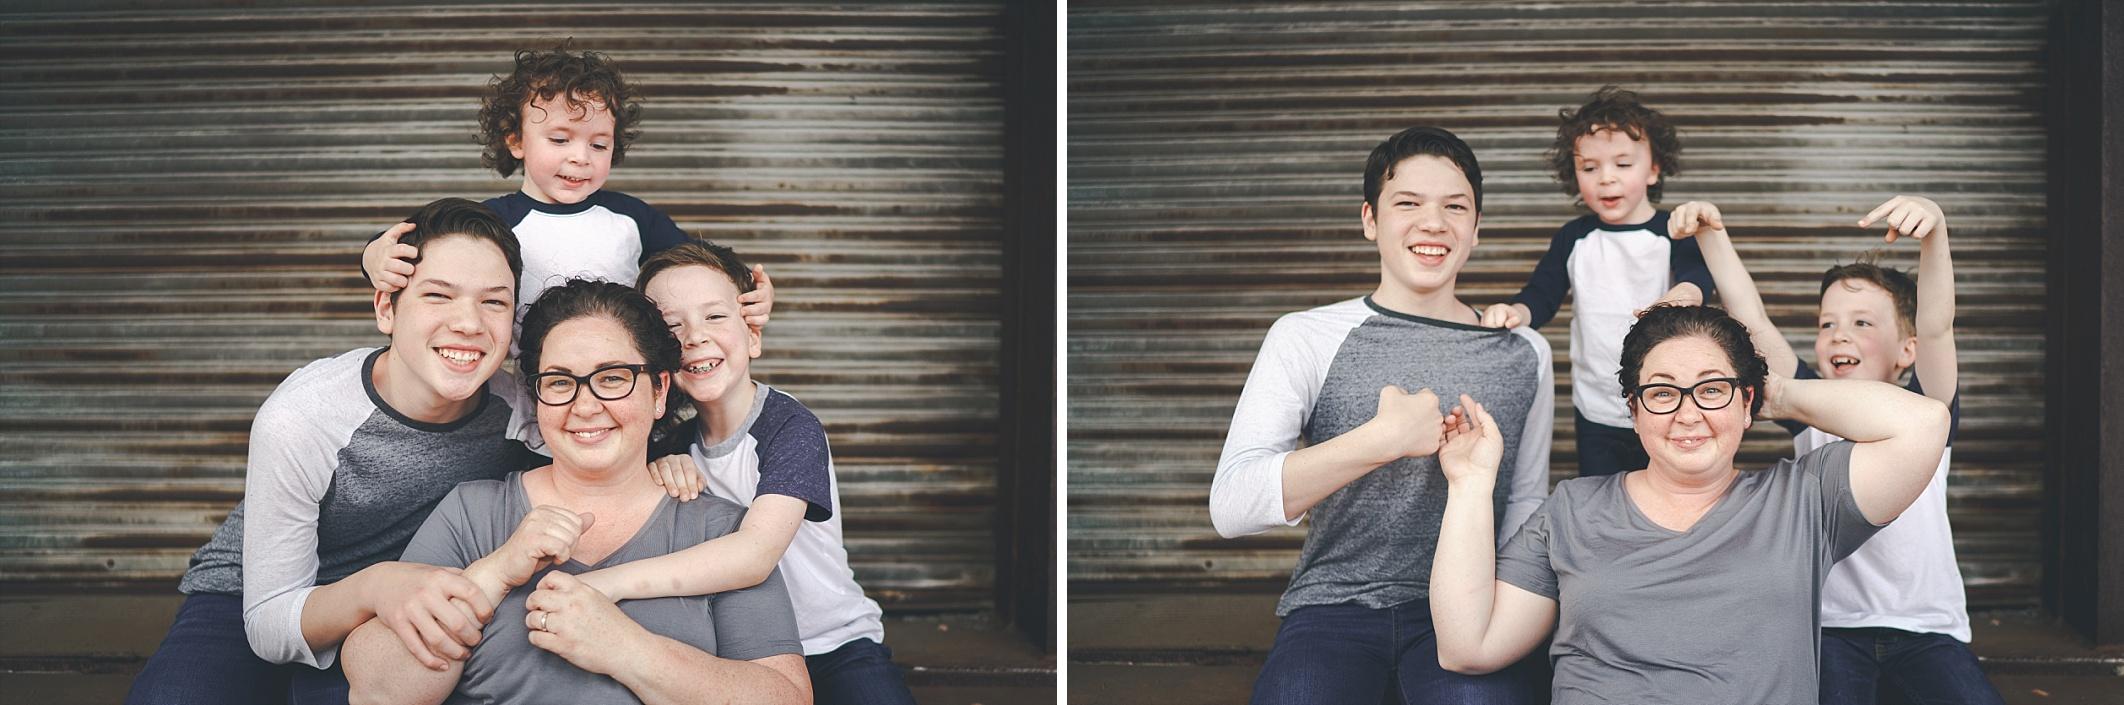 0023_young-family-children-photography-dayton.jpg